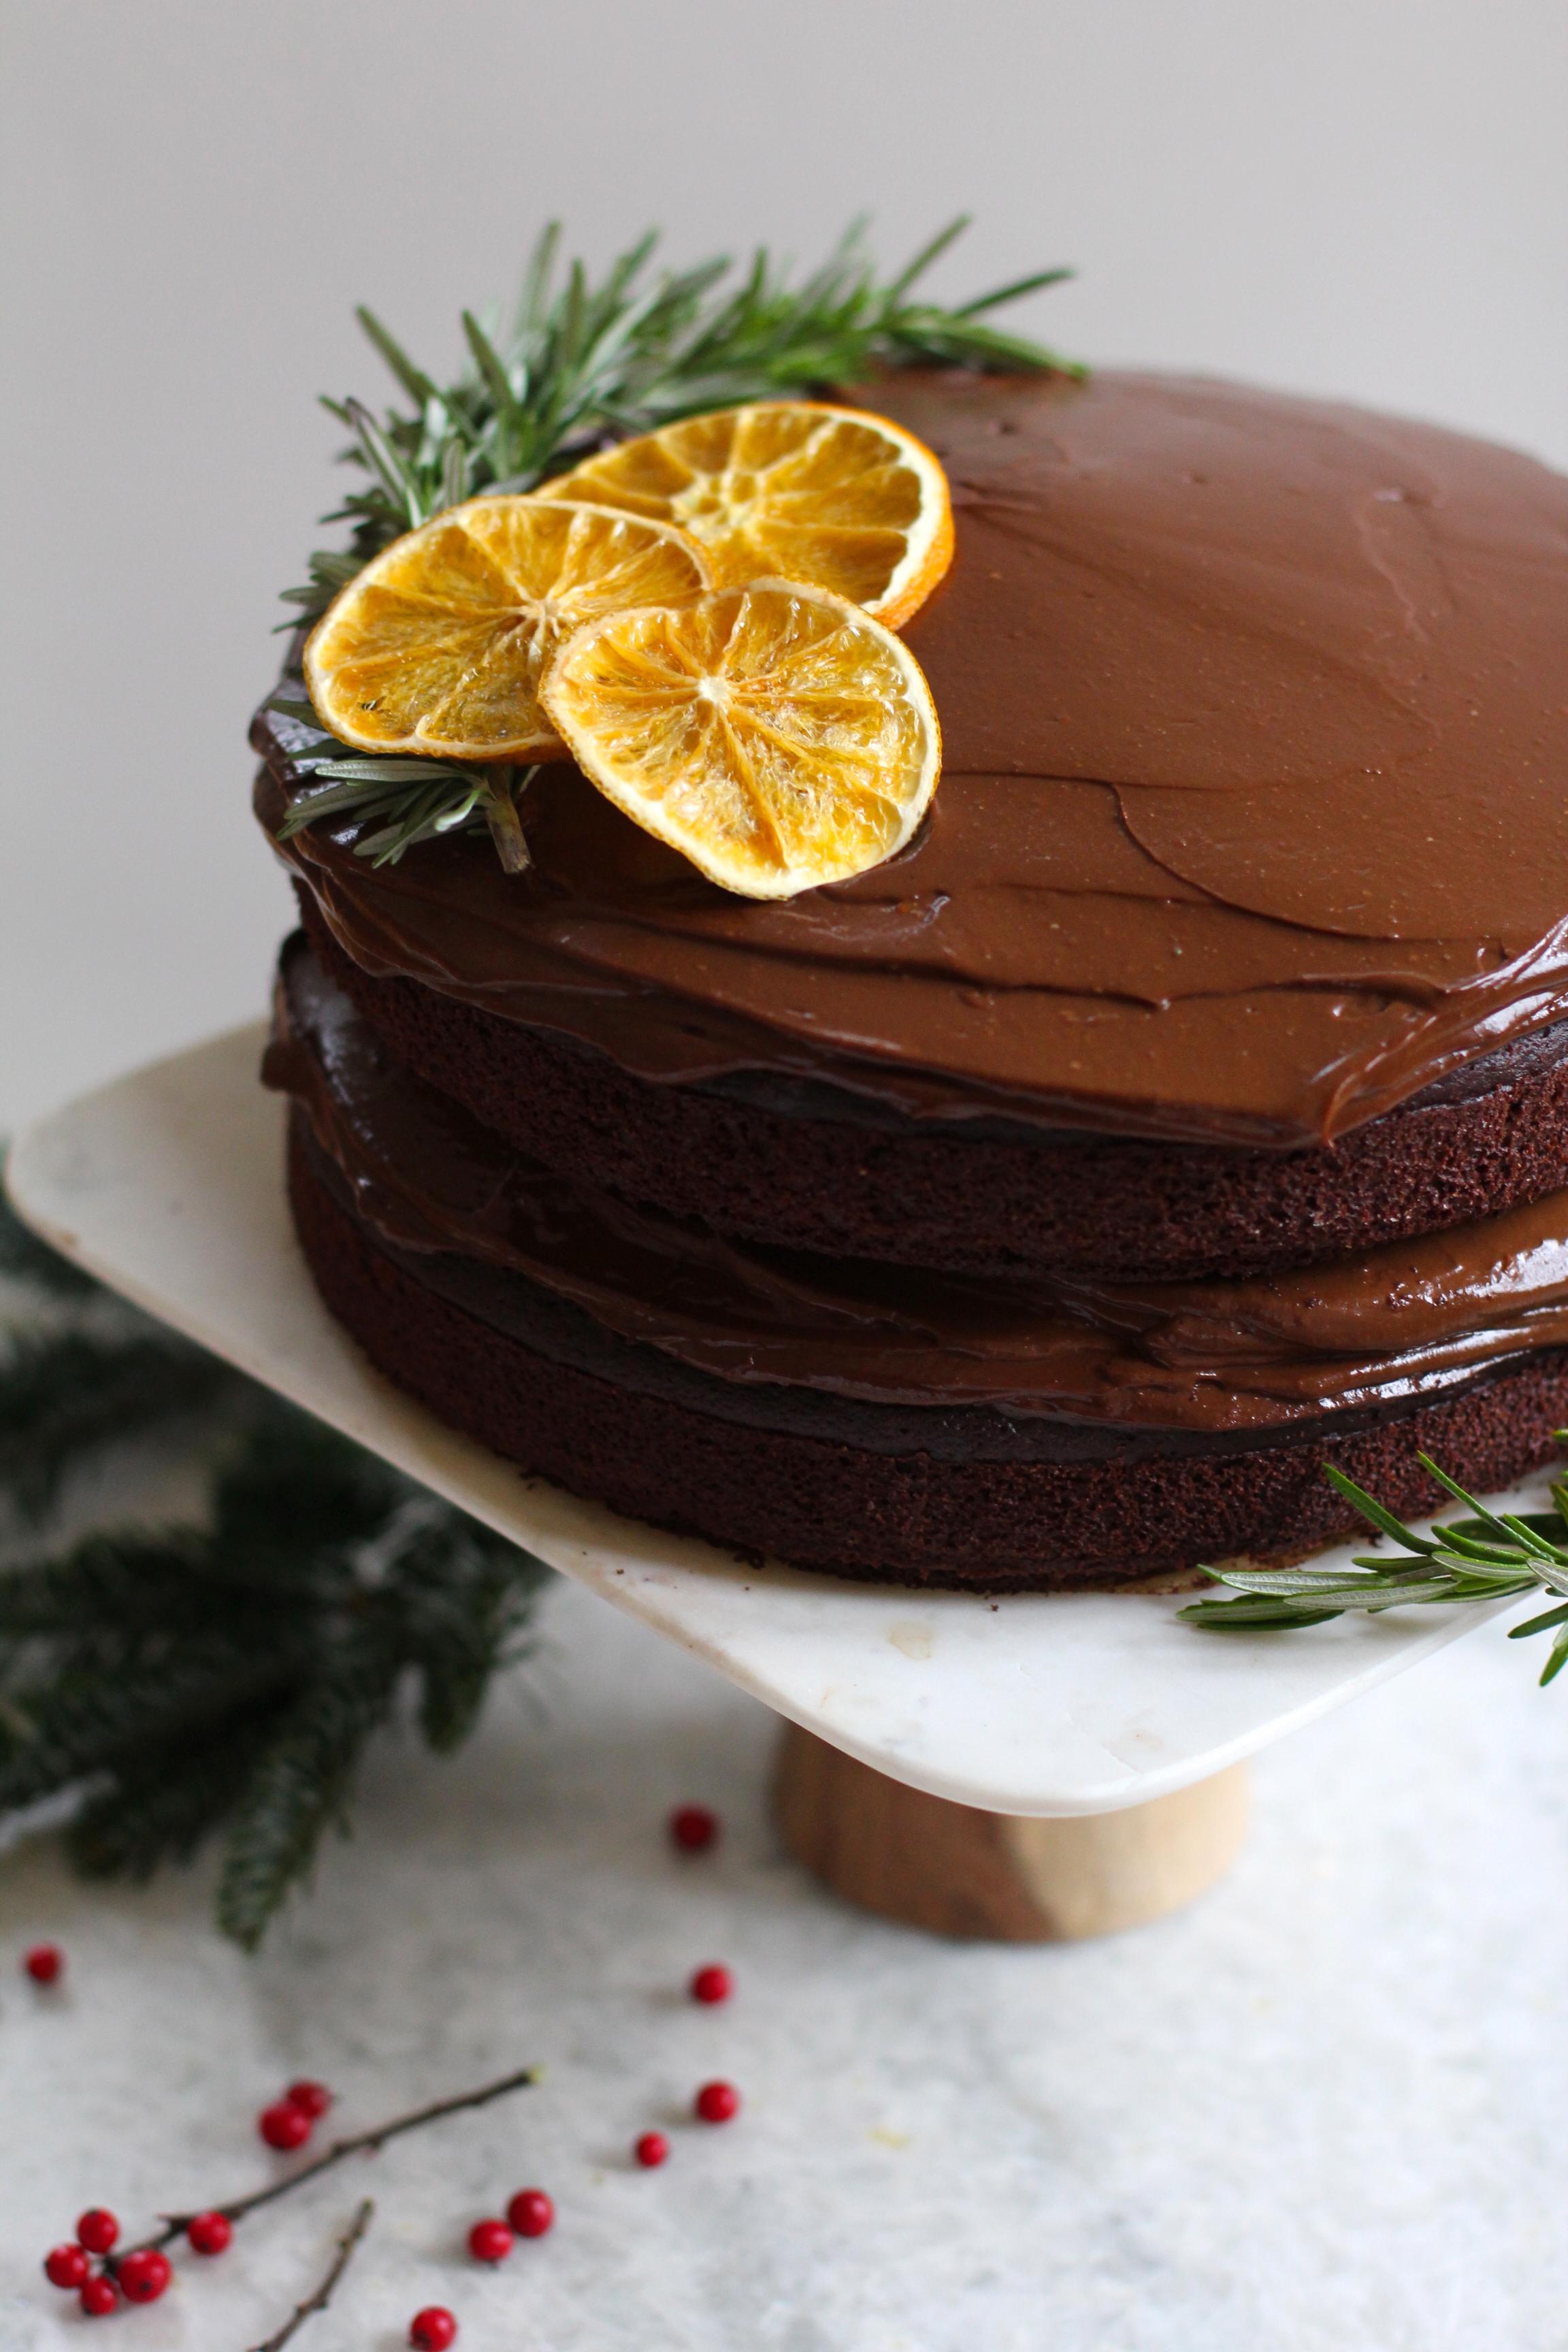 Recipe Box Rosemary Olive Oil Cake with Orange Chocolate Ganache